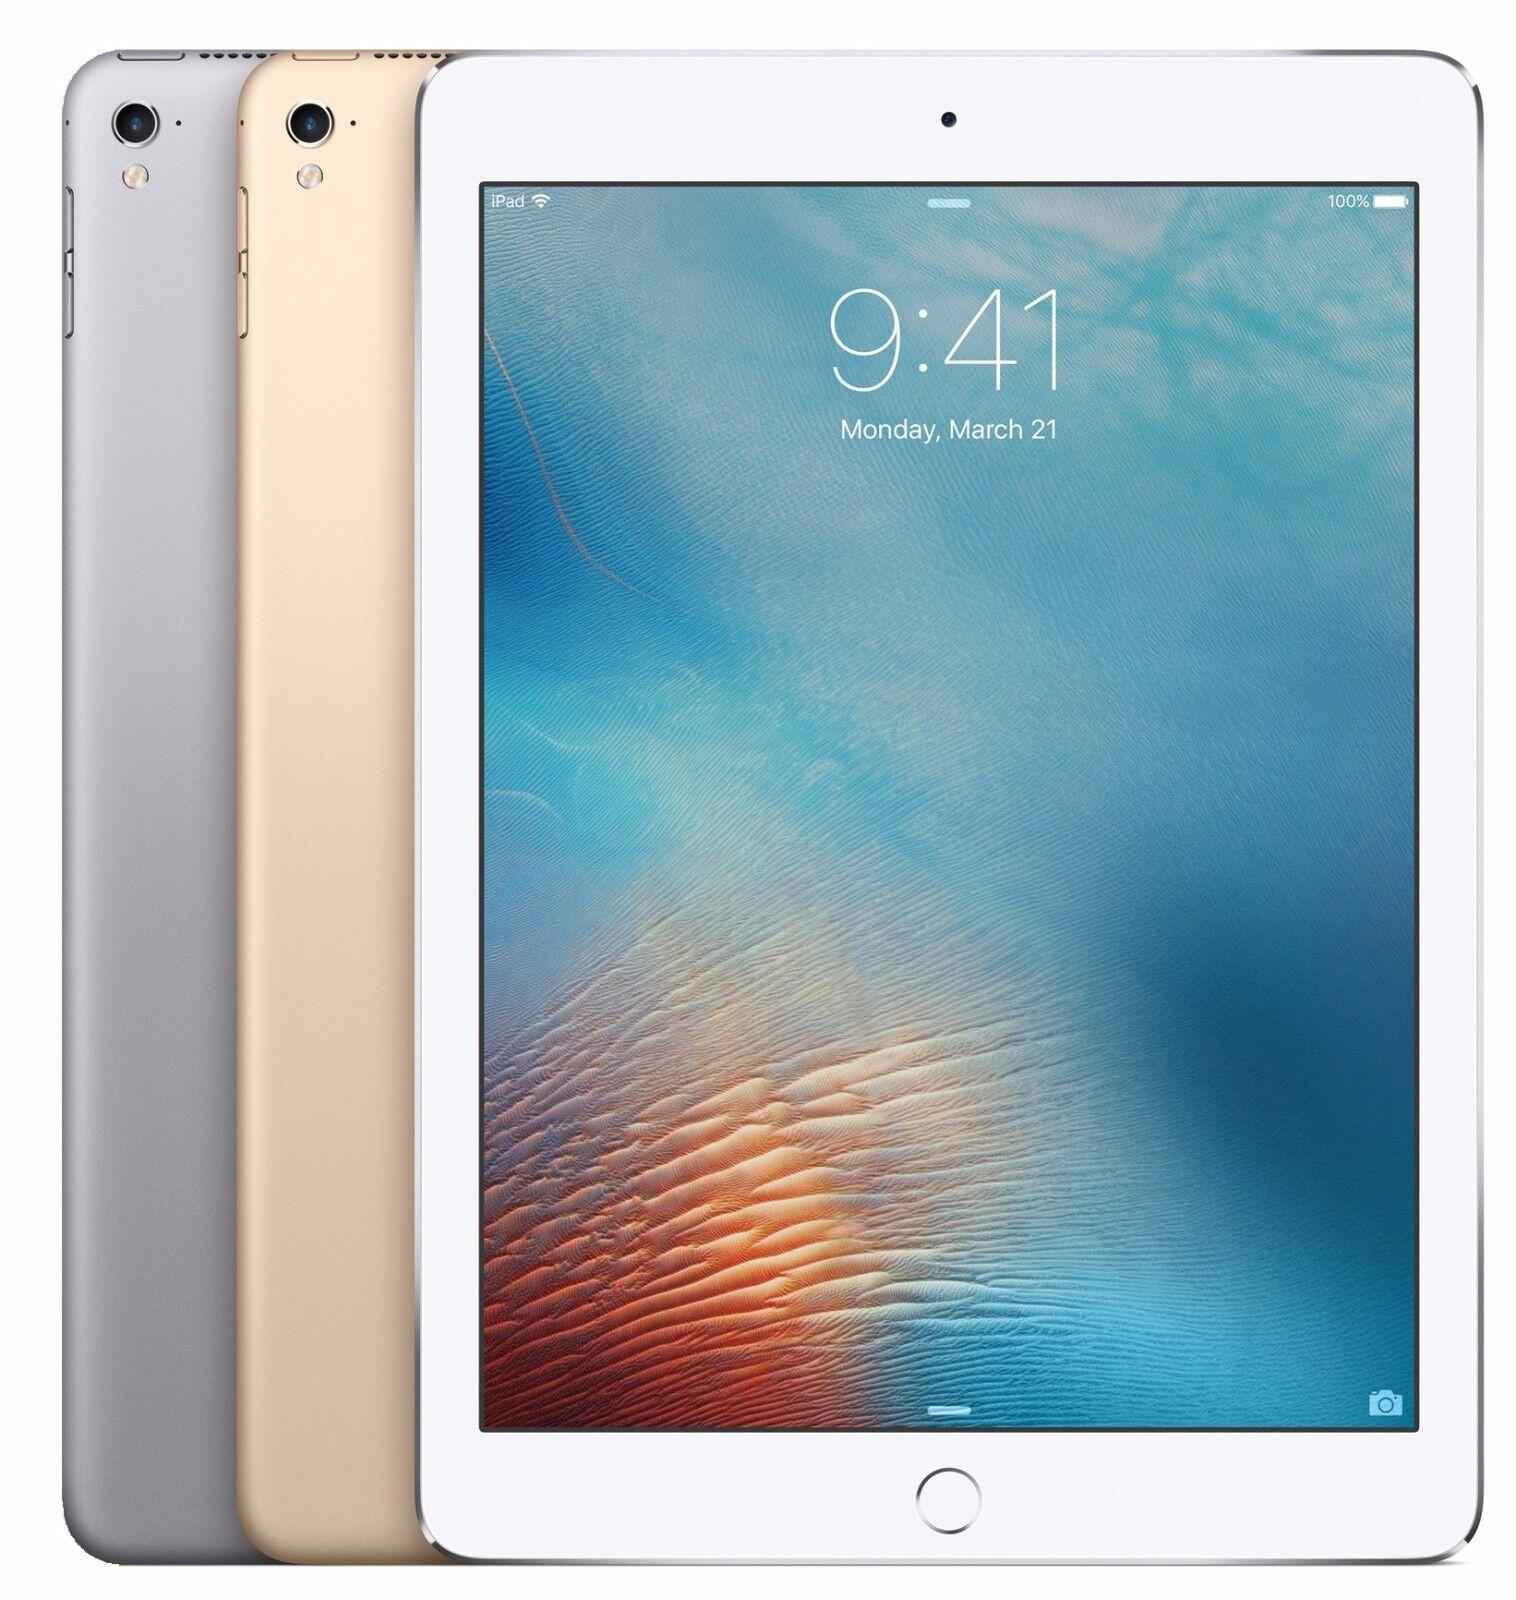 "GRADE A R Apple iPad 6th gen 2018 32GB WiFi 9.7/"" Touch ID GOLD GRAY SILVER"